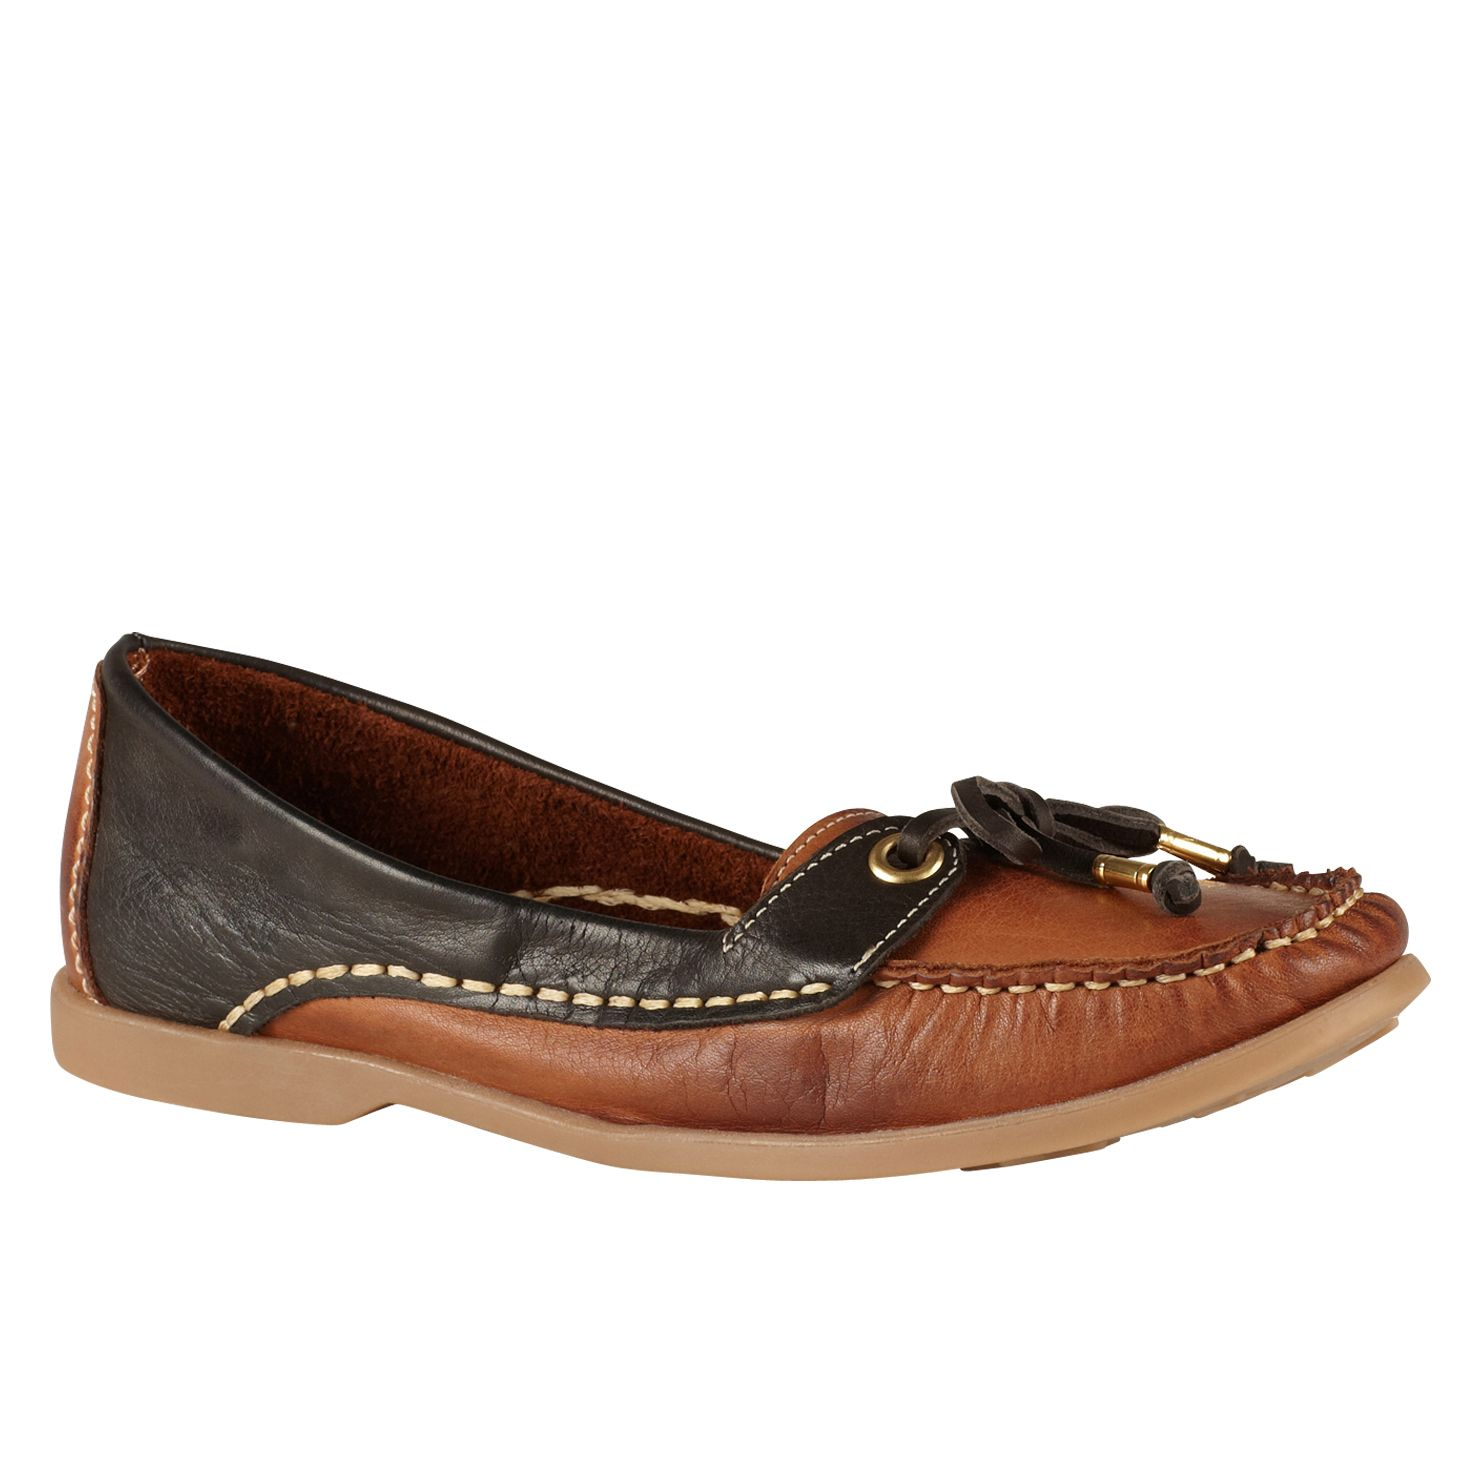 Aldo Alovien Flat Loafer Shoes In Brown For Men | Lyst